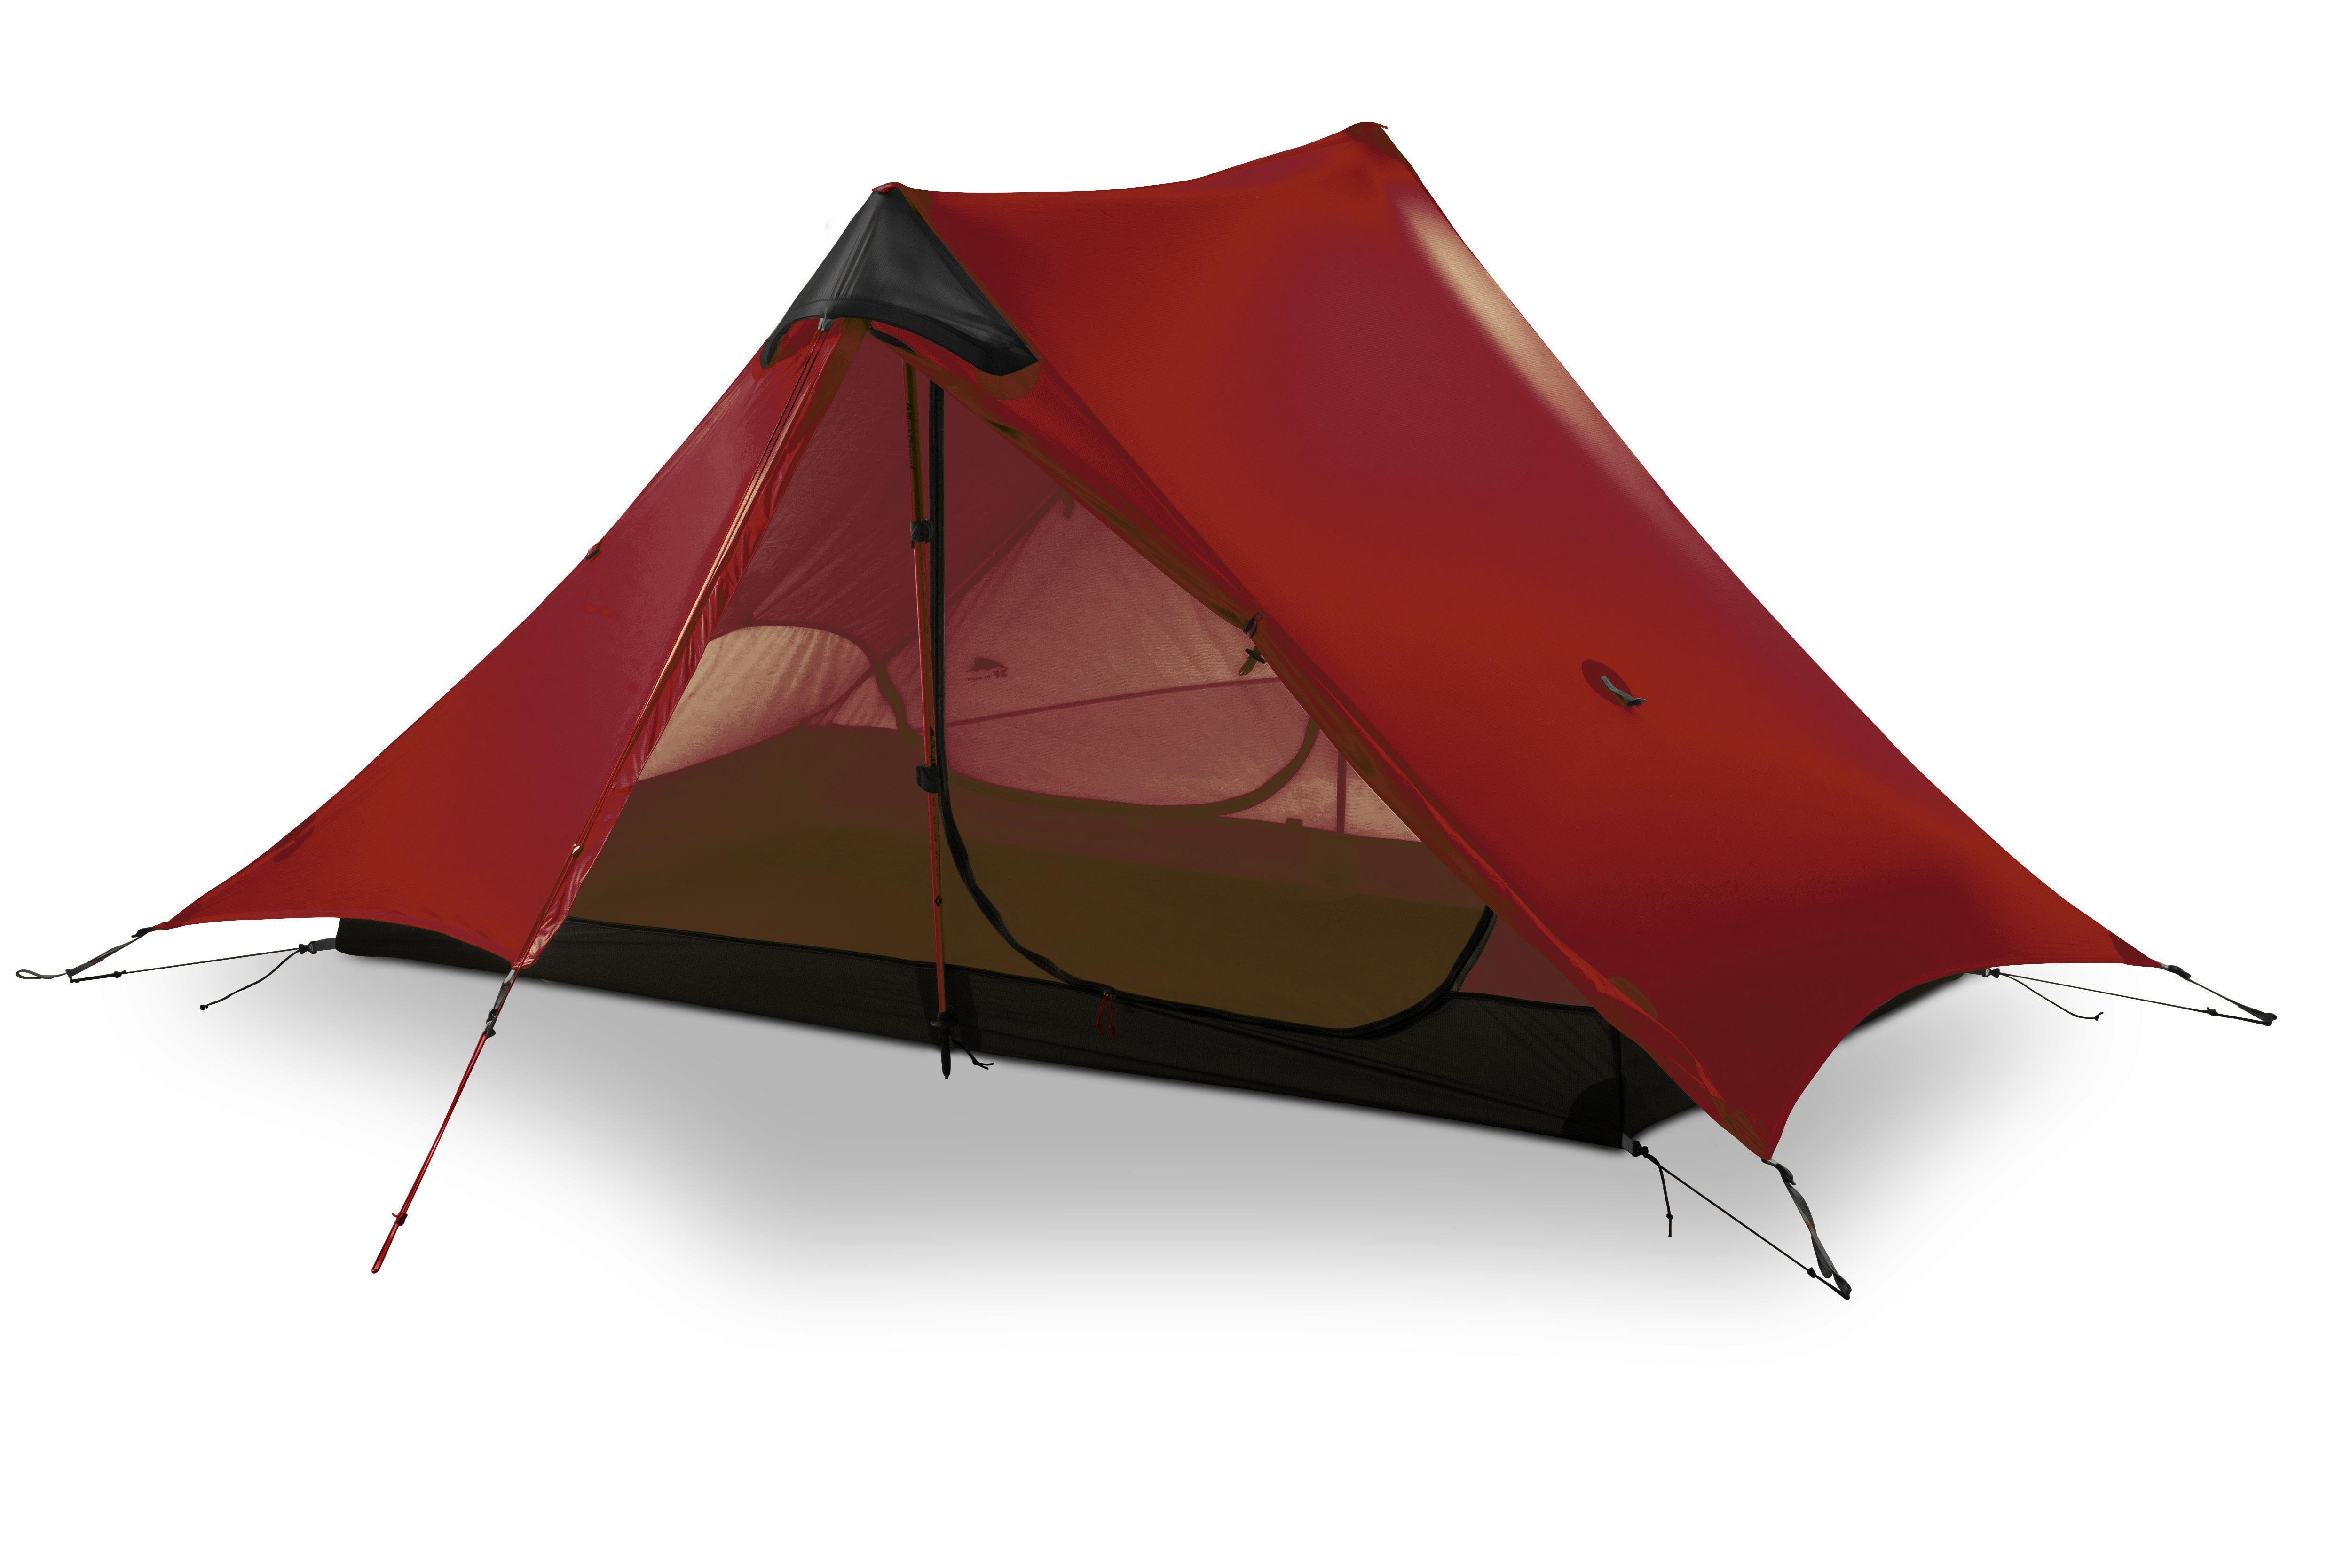 3F UL GEAR LanShan 2 Stockless 1 Person 2 Person Tent Oudoor Ultralight Camping 15D Silnylon 3 Season Tent Winter 4 Season Tent